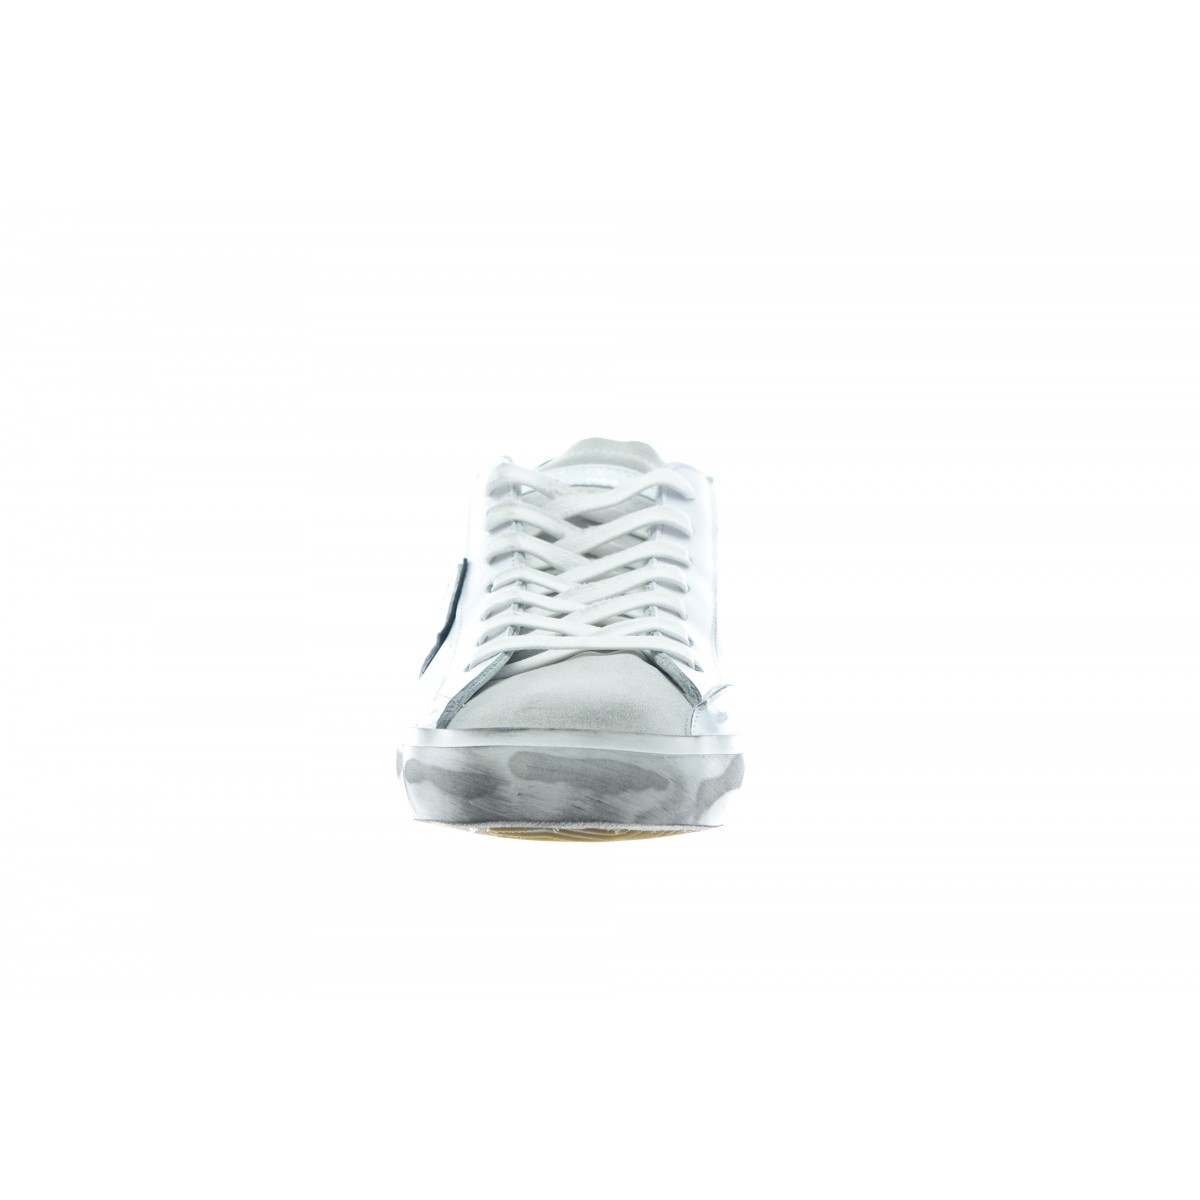 Sneakers - PRLU V016 leather suede